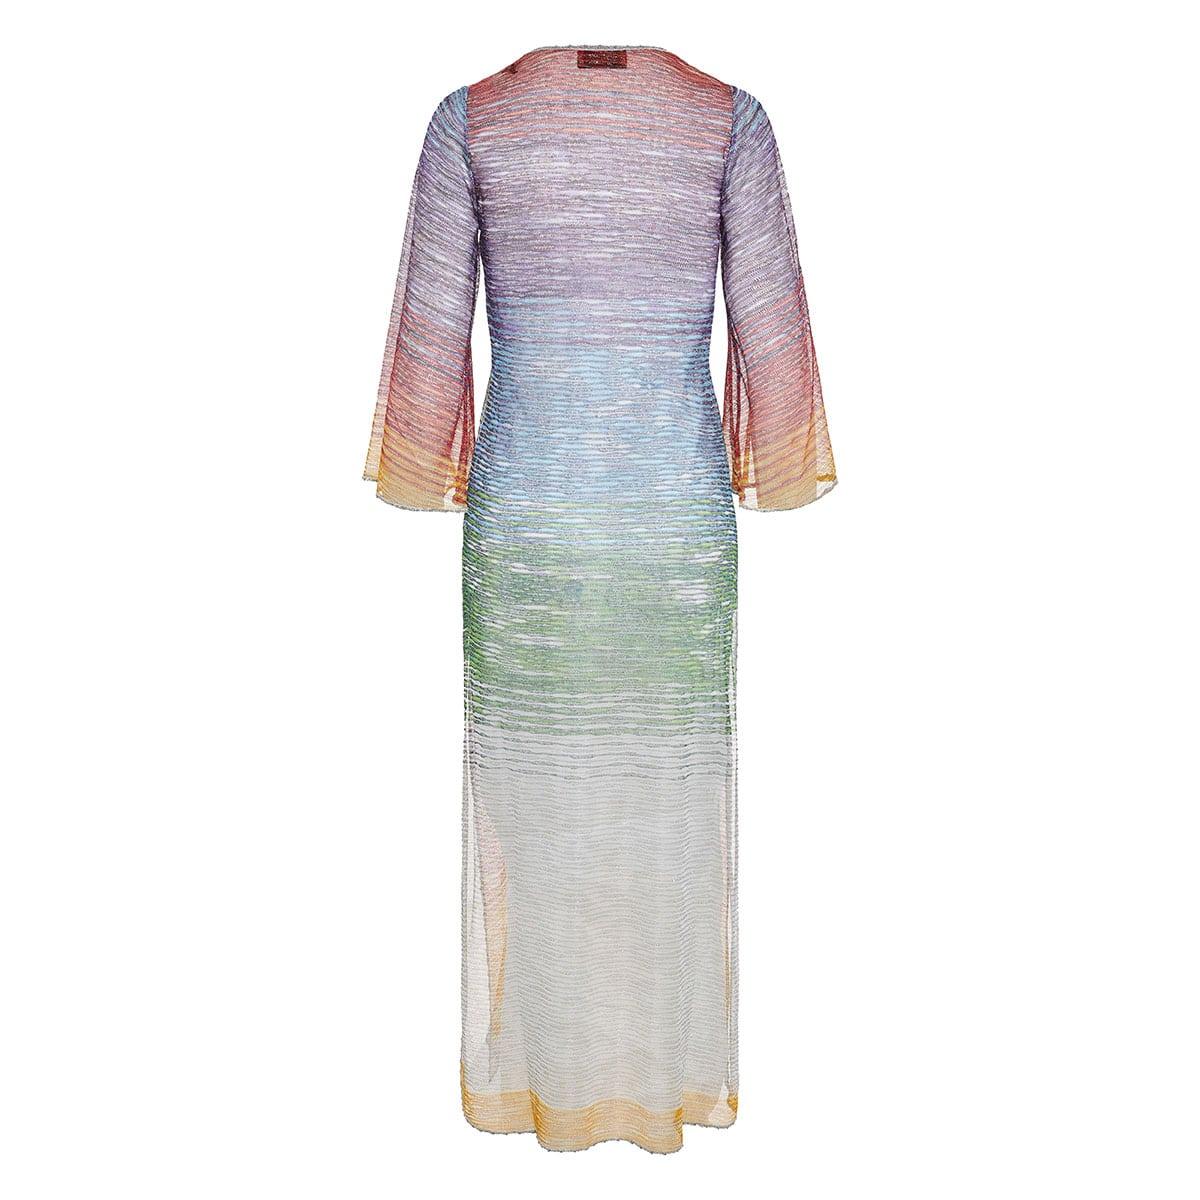 Striped long knitted beach dressStriped long knitted beach dress